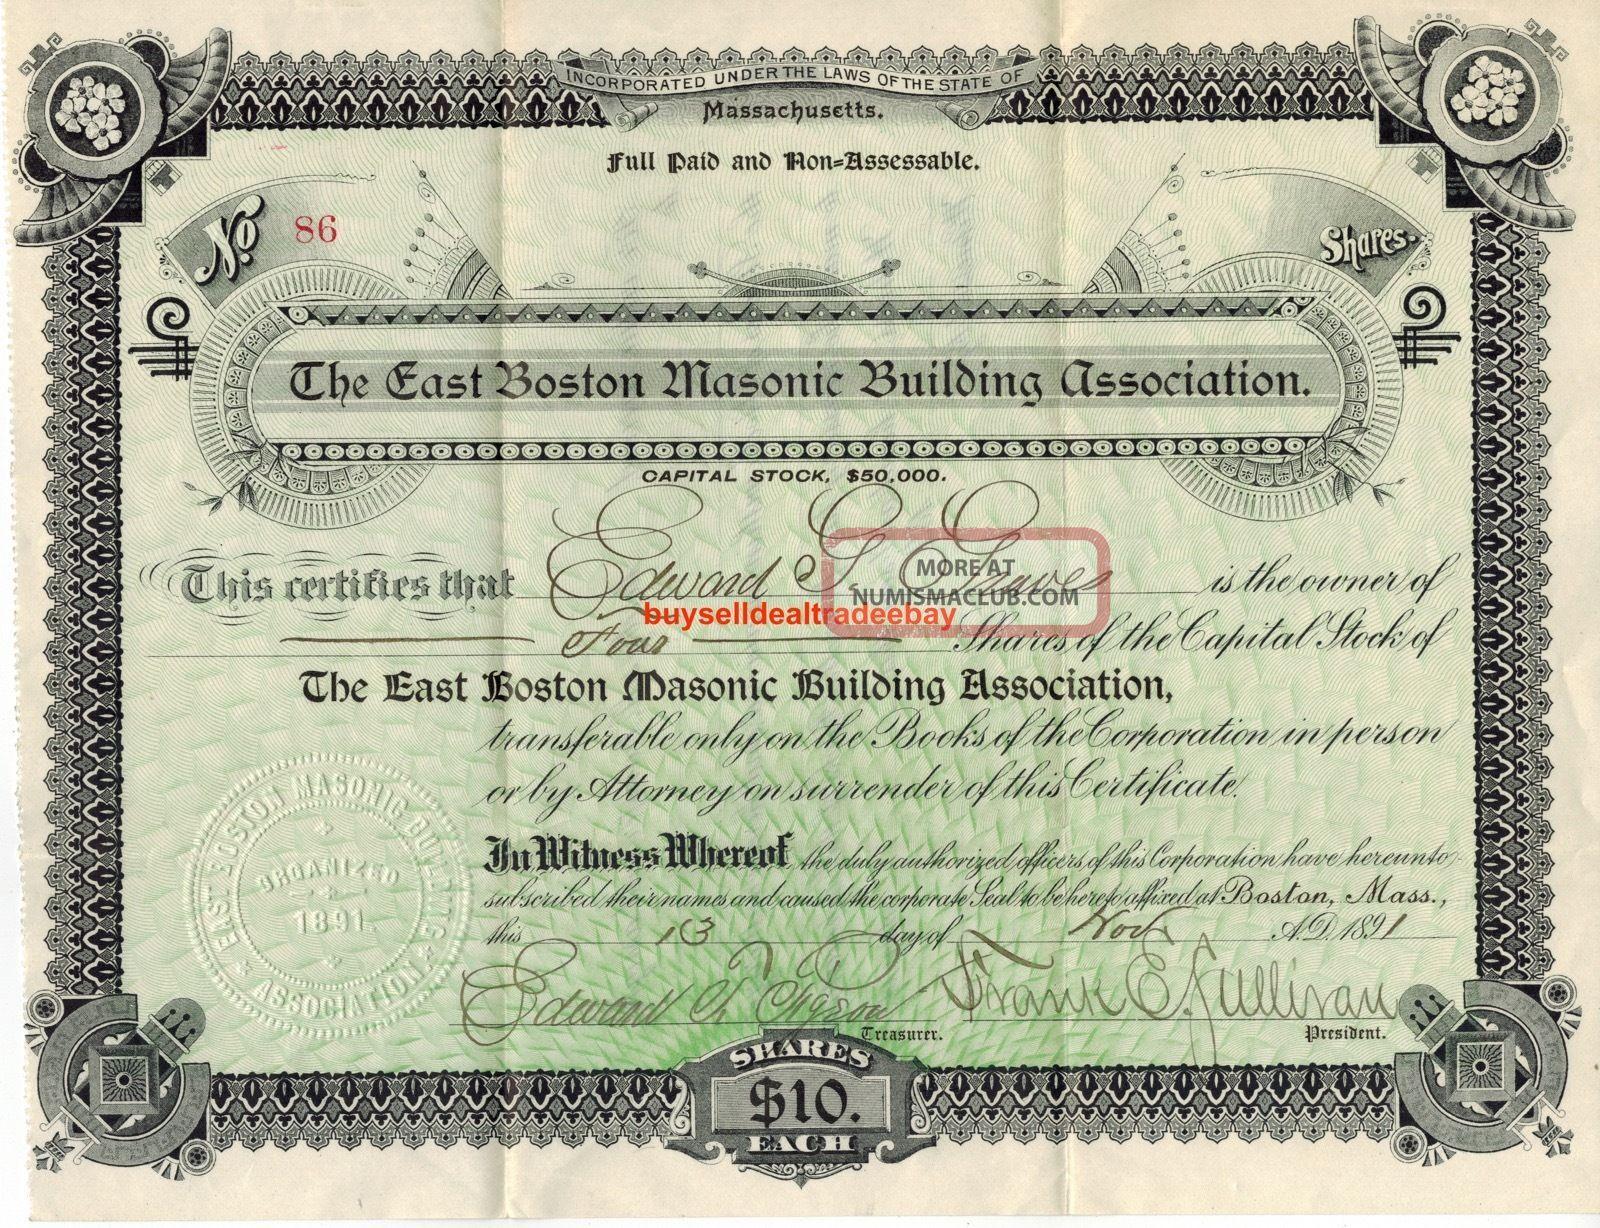 1891 East Boston Masonic Building Association Bond Stock Certificate Shares Rare Stocks & Bonds, Scripophily photo